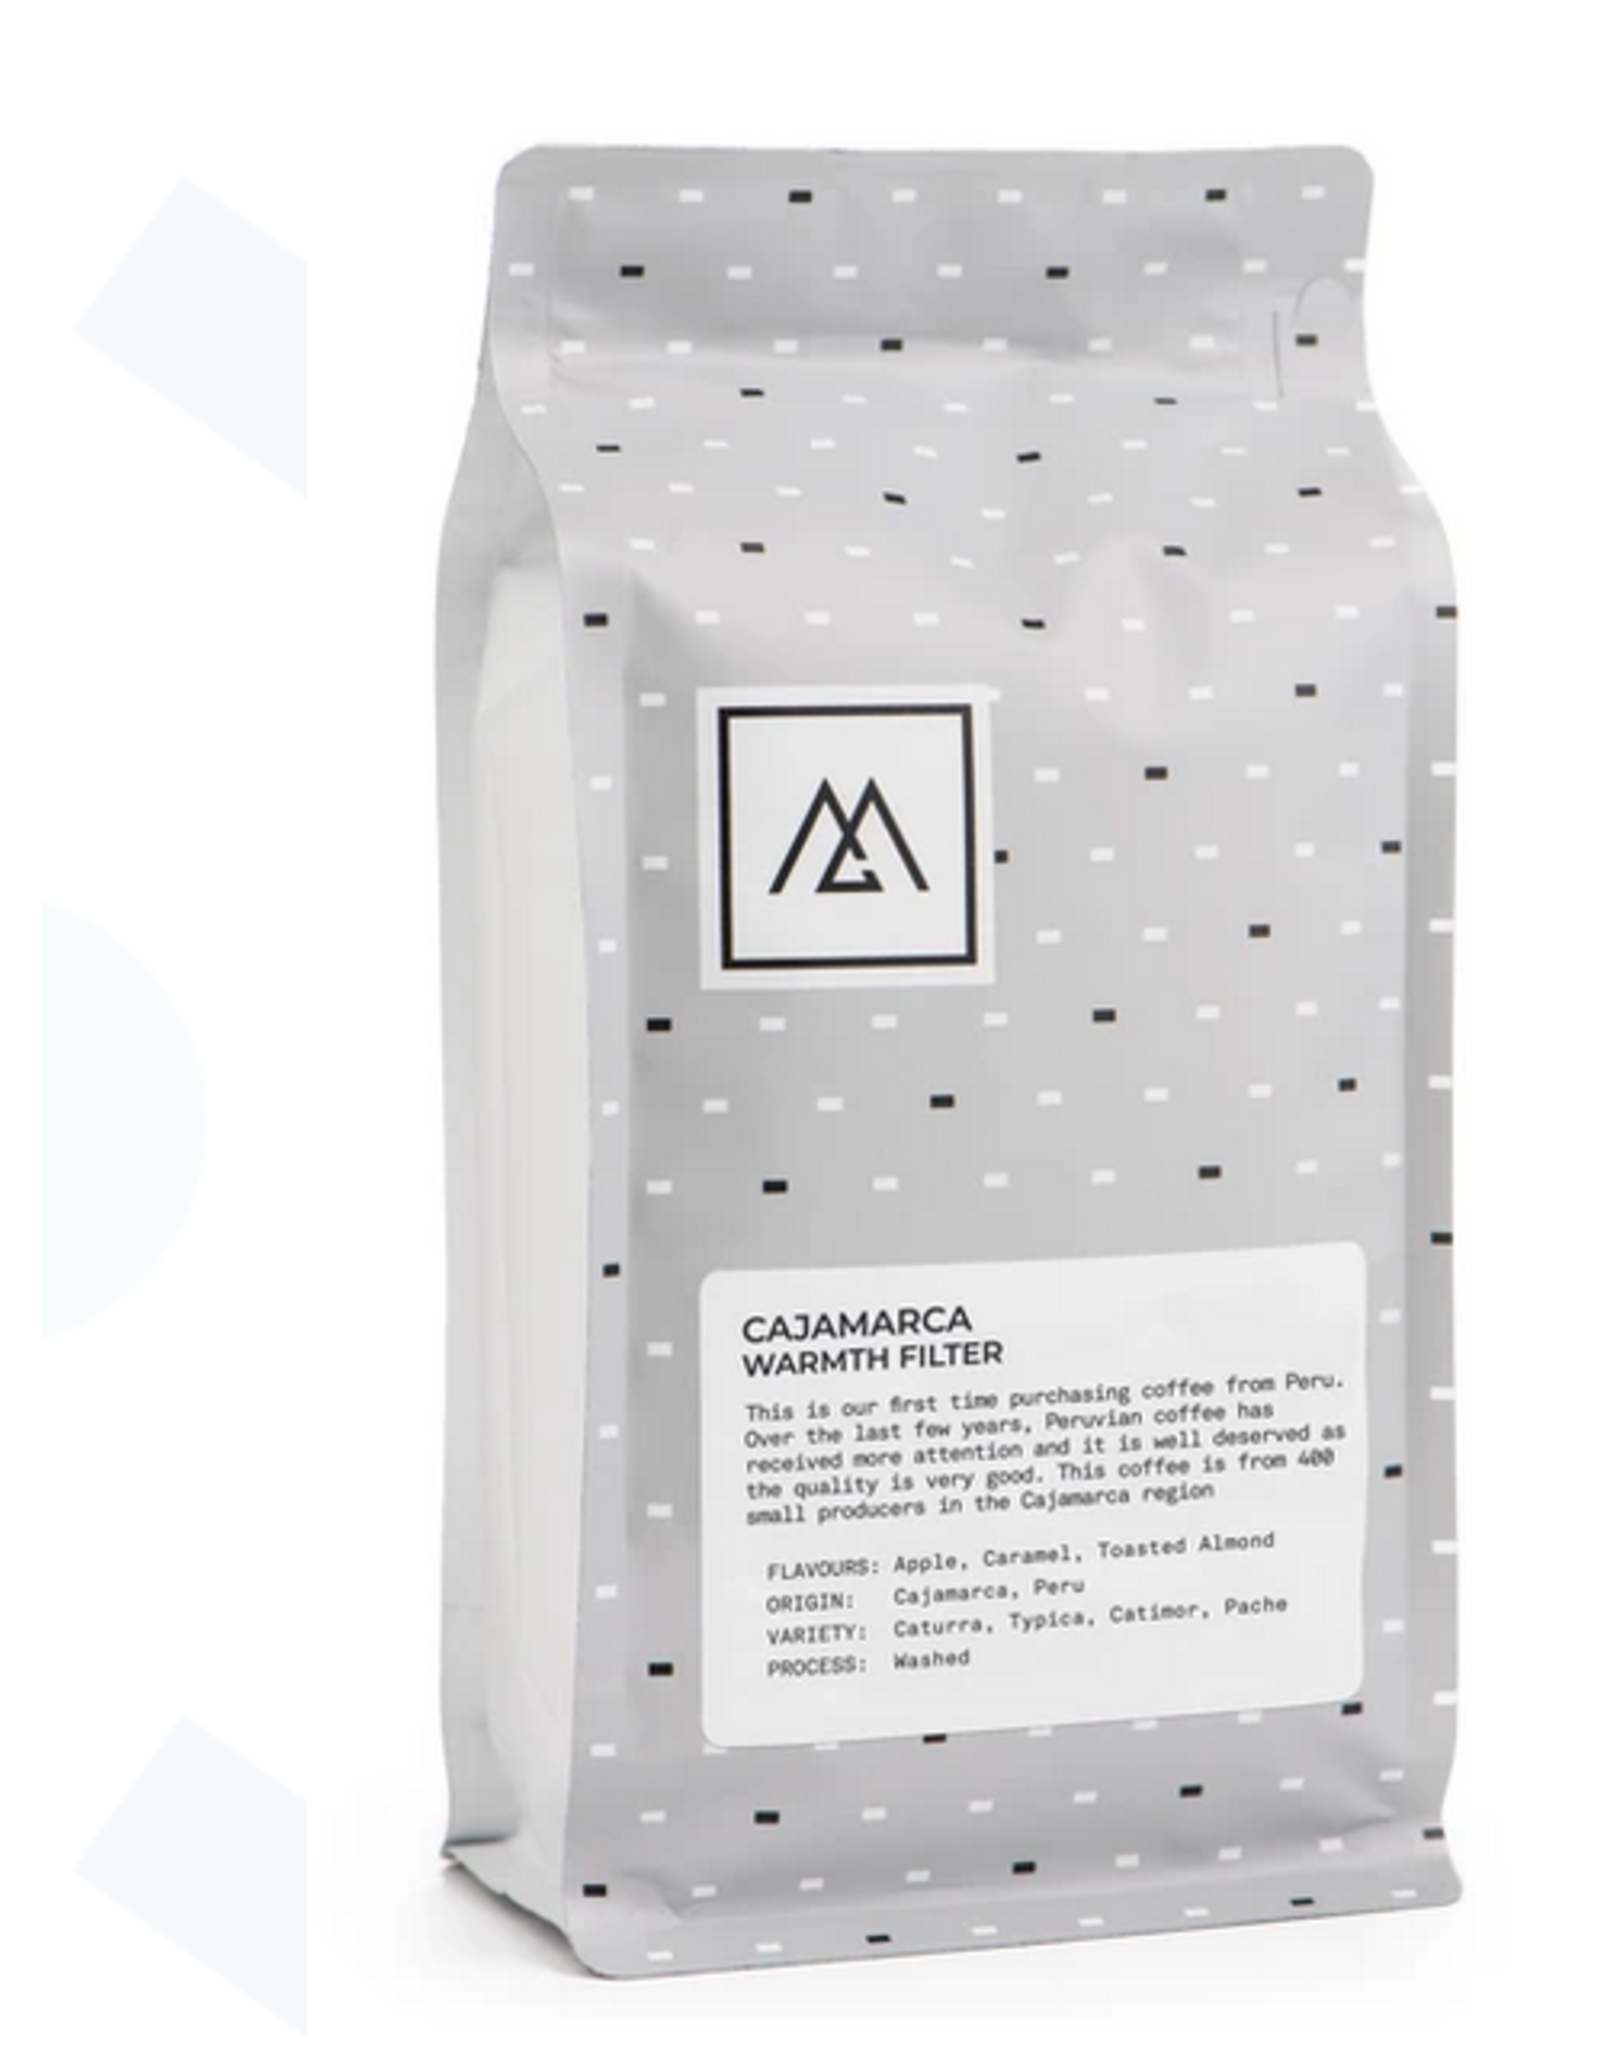 Monogram Coffee Monogram Coffee, Cajamarca - Warmth Filter